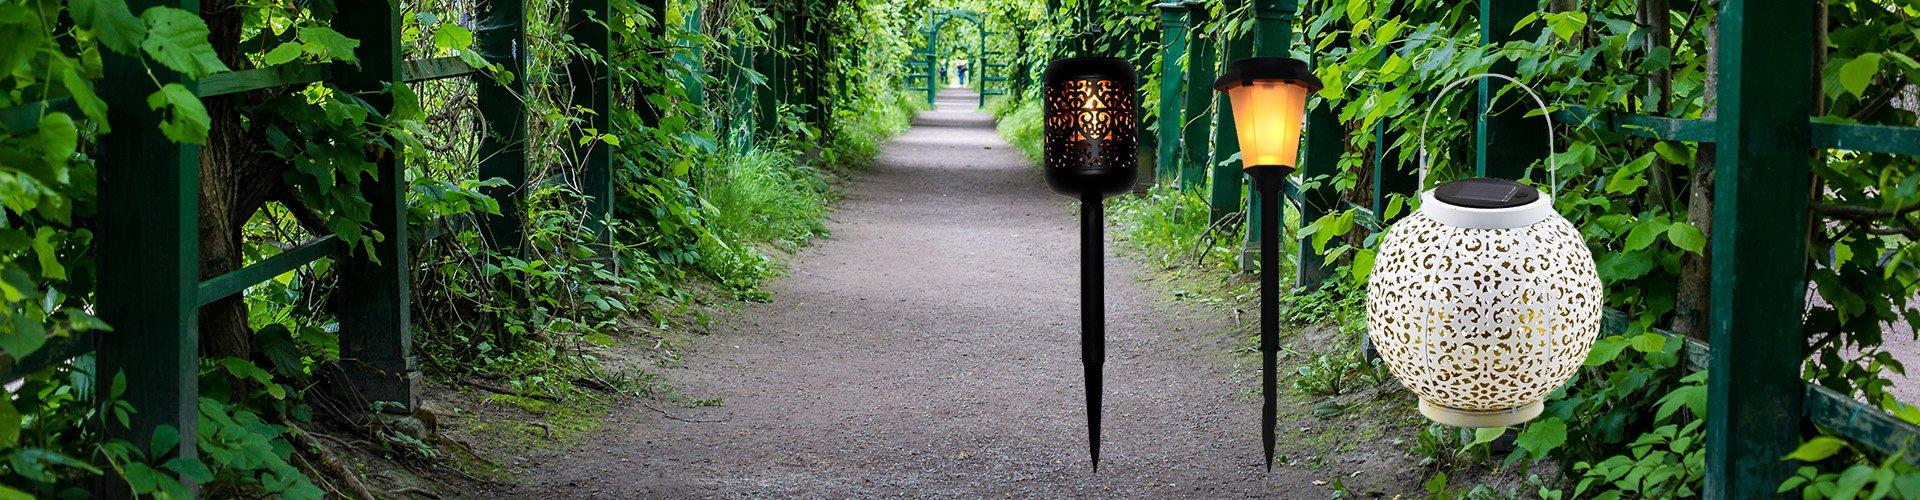 gardening light